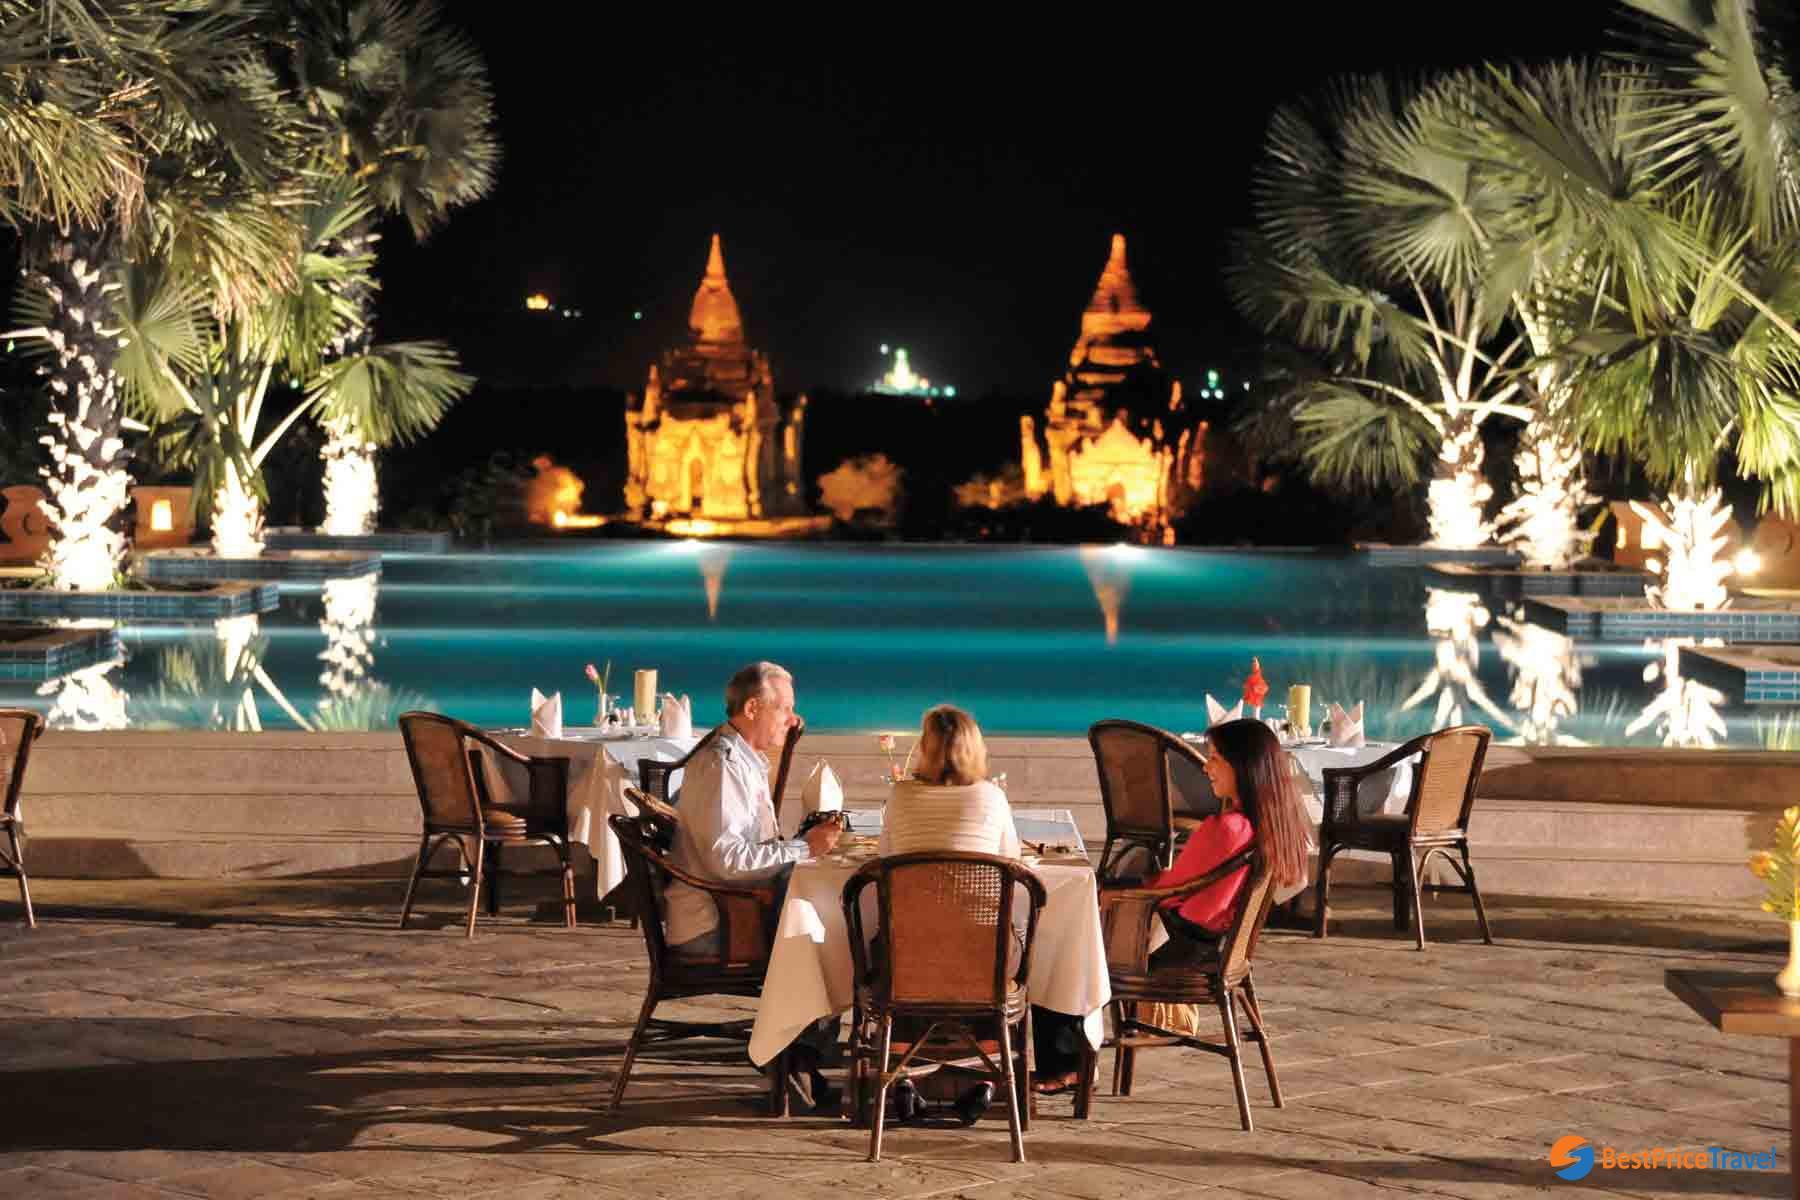 Enjoy dinner at Aureum Palace Hotel & Resort Bagan